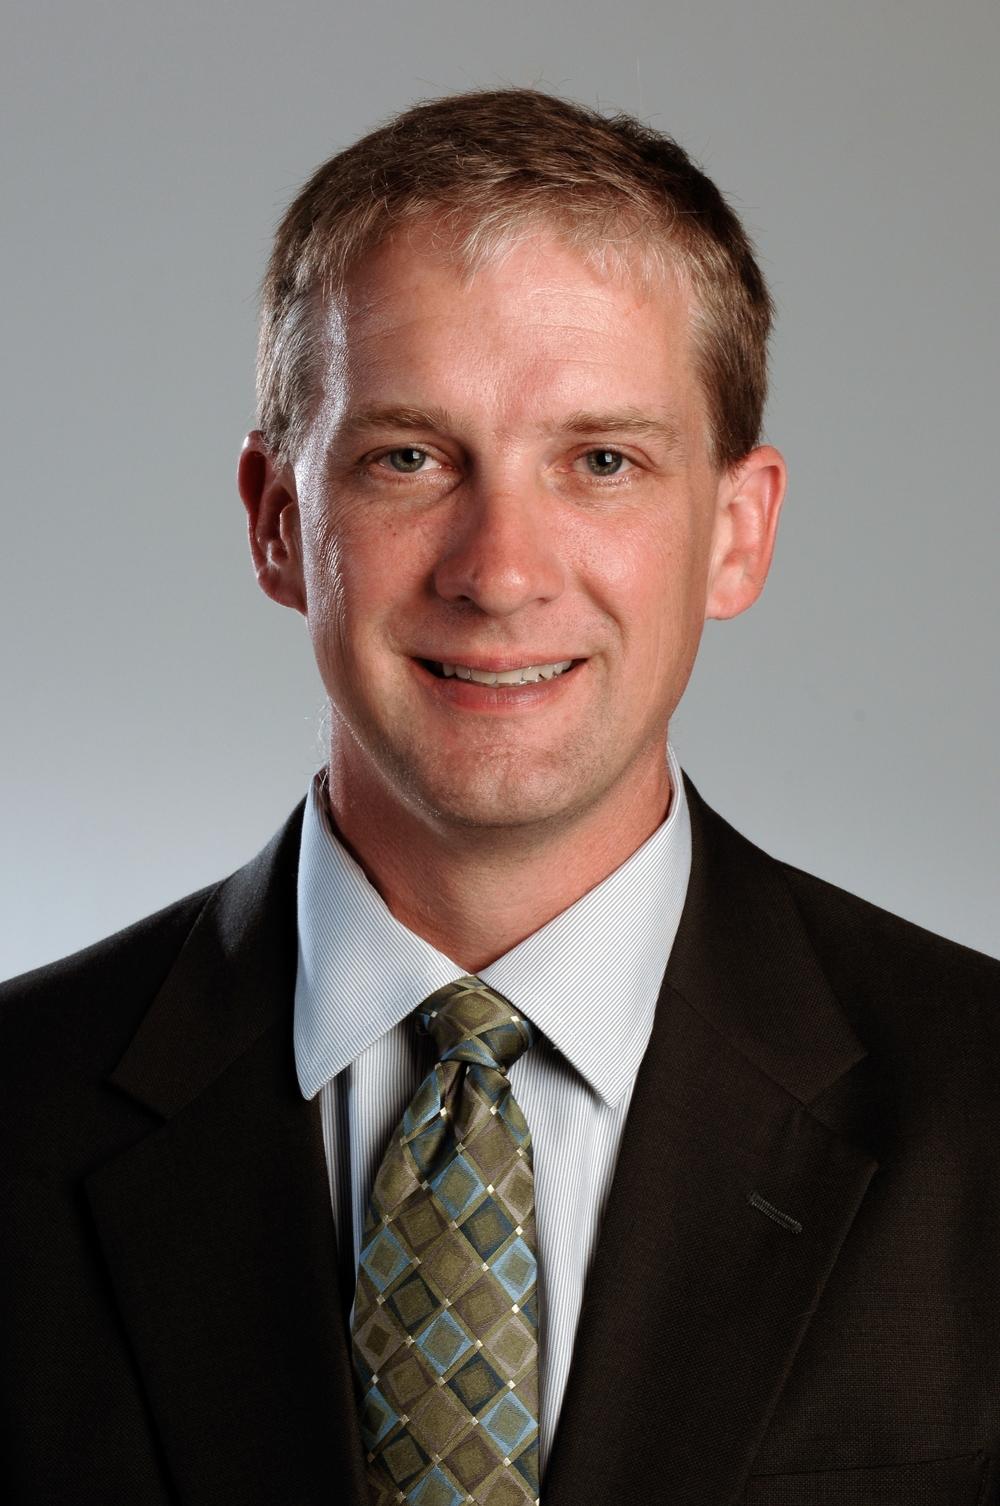 Dr. Mark Alley: Veterinarian, North Carolina State University